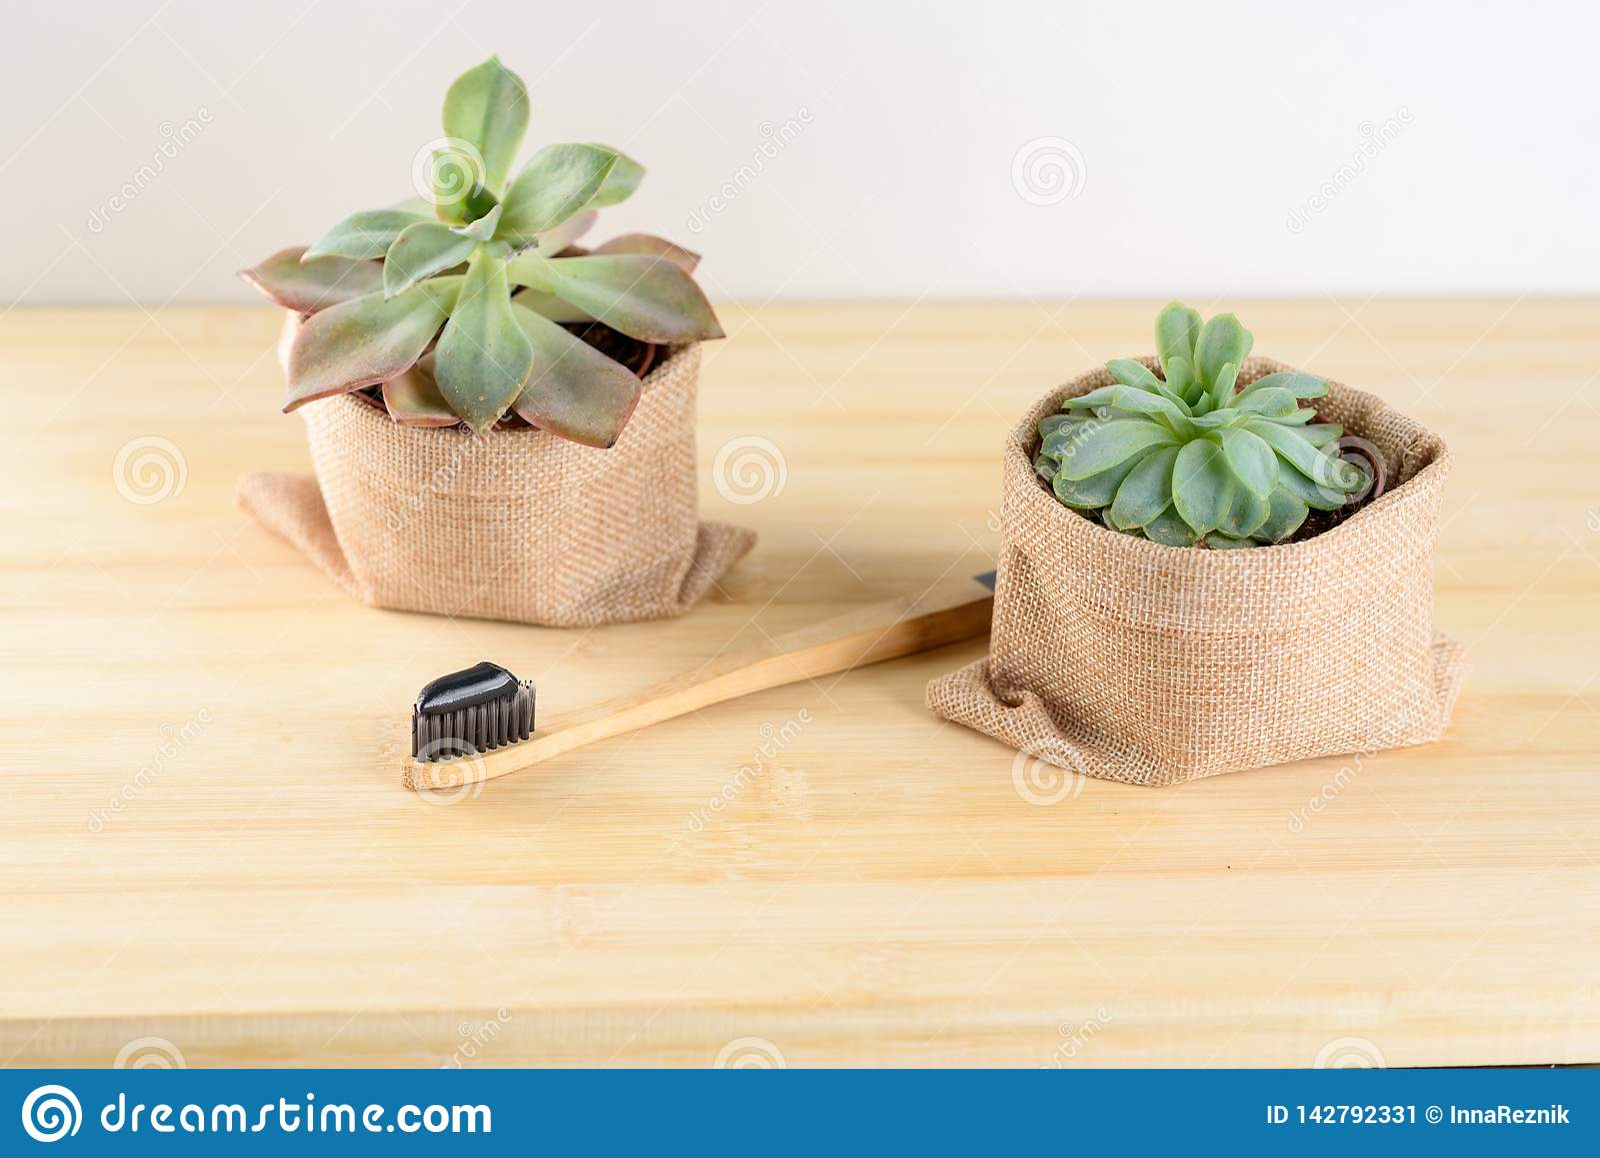 Бамбуковая зубная щетка с зубной пастой угля